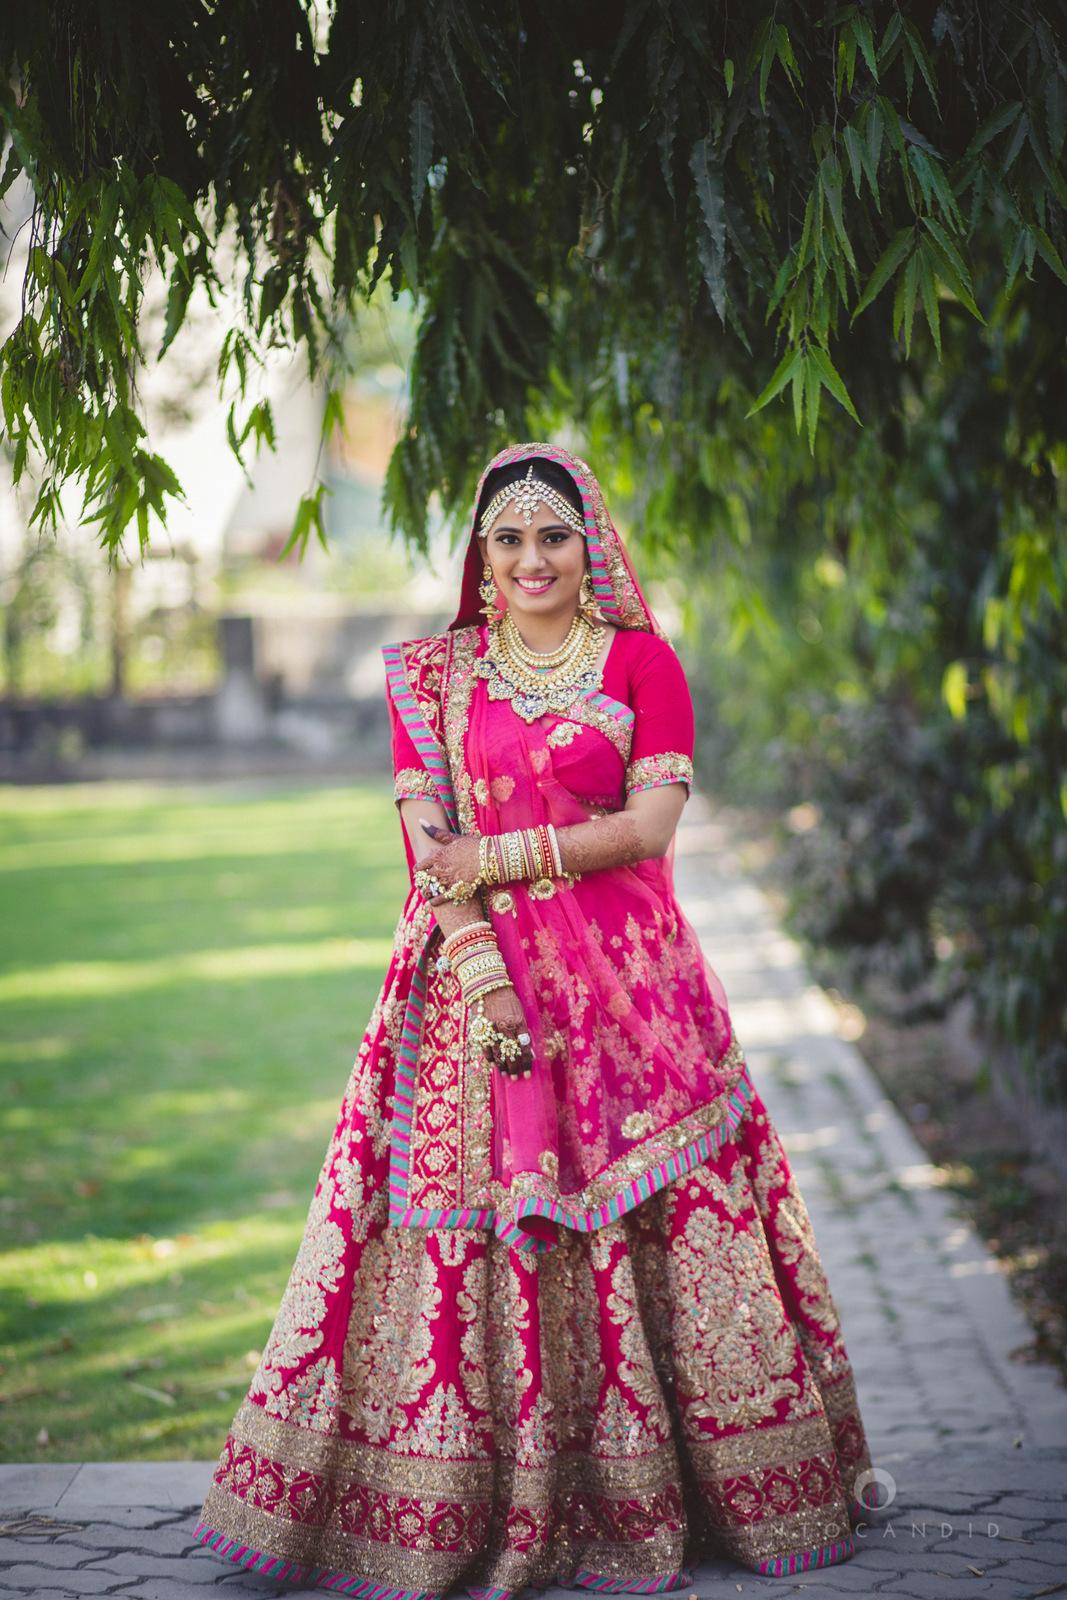 mumbai-gujarati-wedding-photographer-intocandid-photography-tg-017.jpg